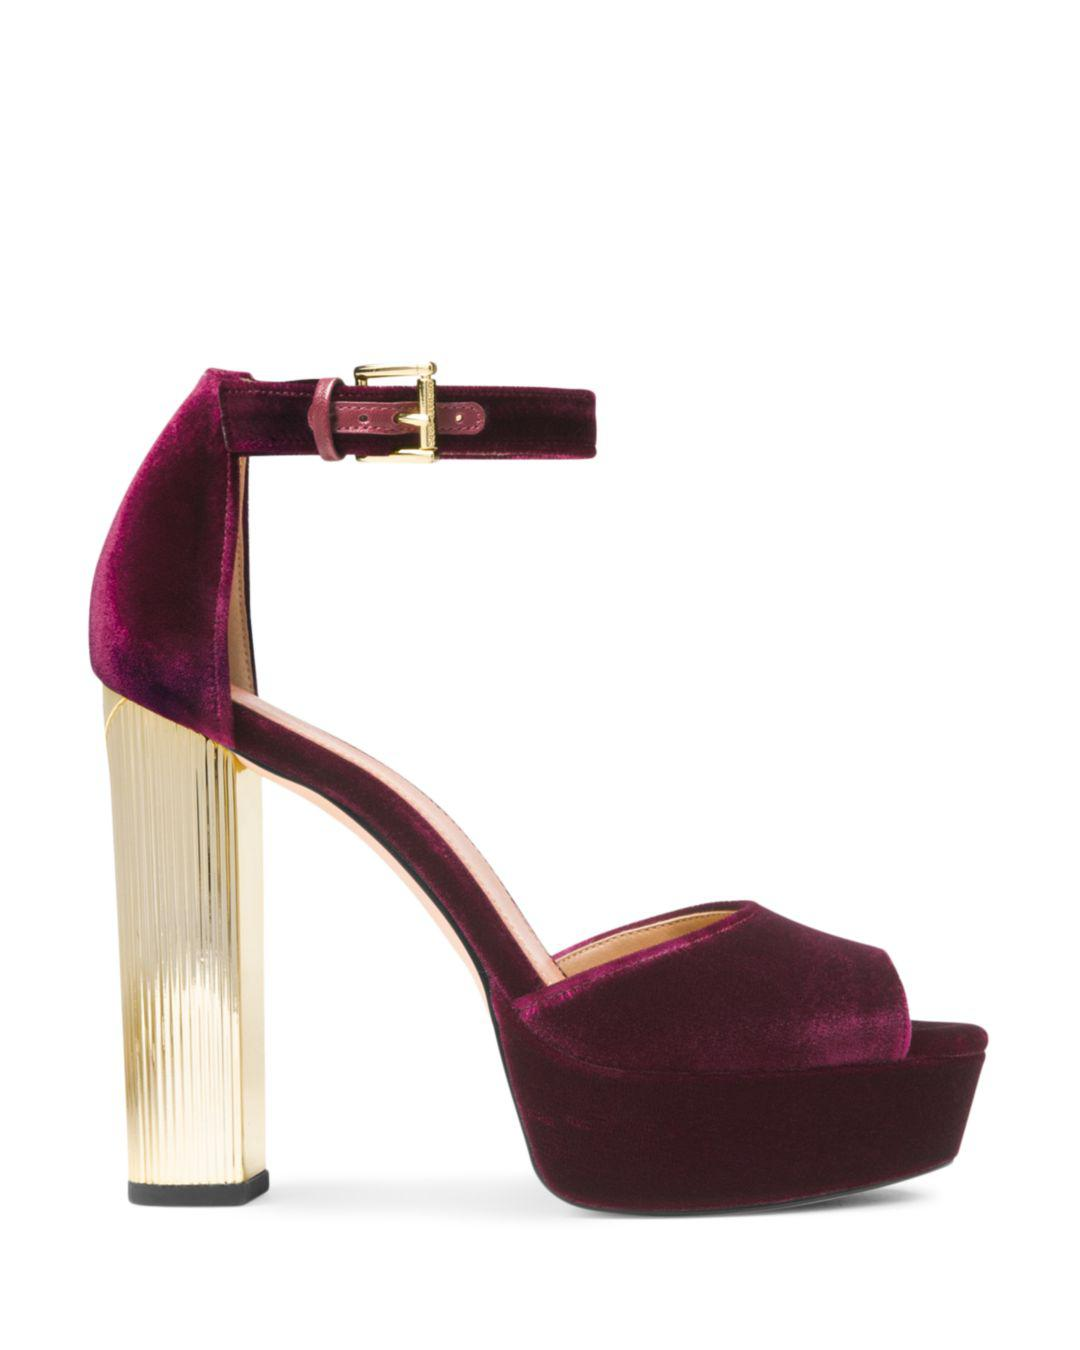 5c3e2b8a339 MICHAEL Michael Kors Women s Paloma Platform Sandals in Purple - Lyst